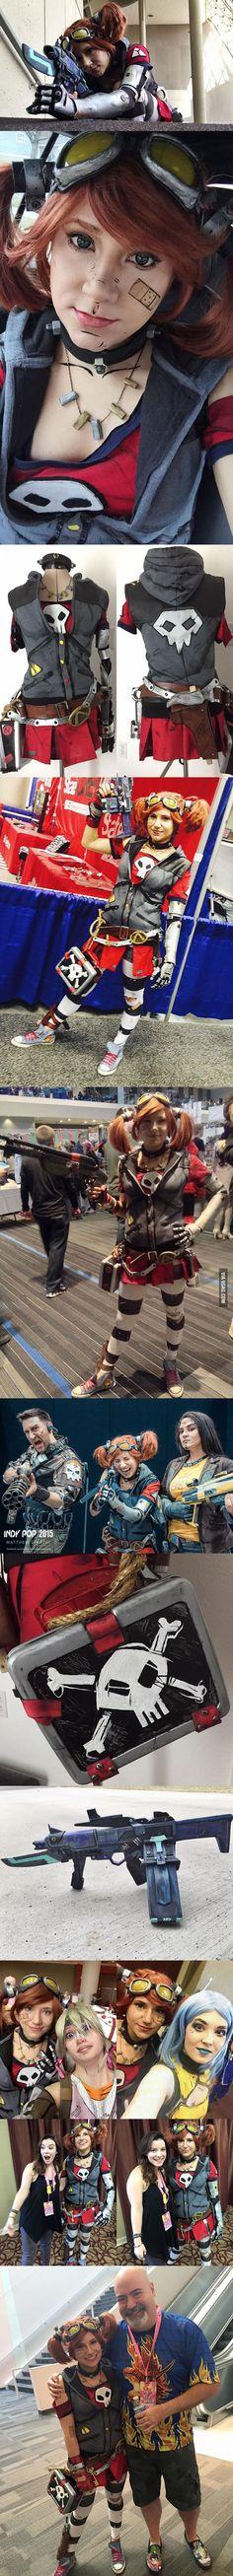 Borderlands 2 cosplay - Gaige